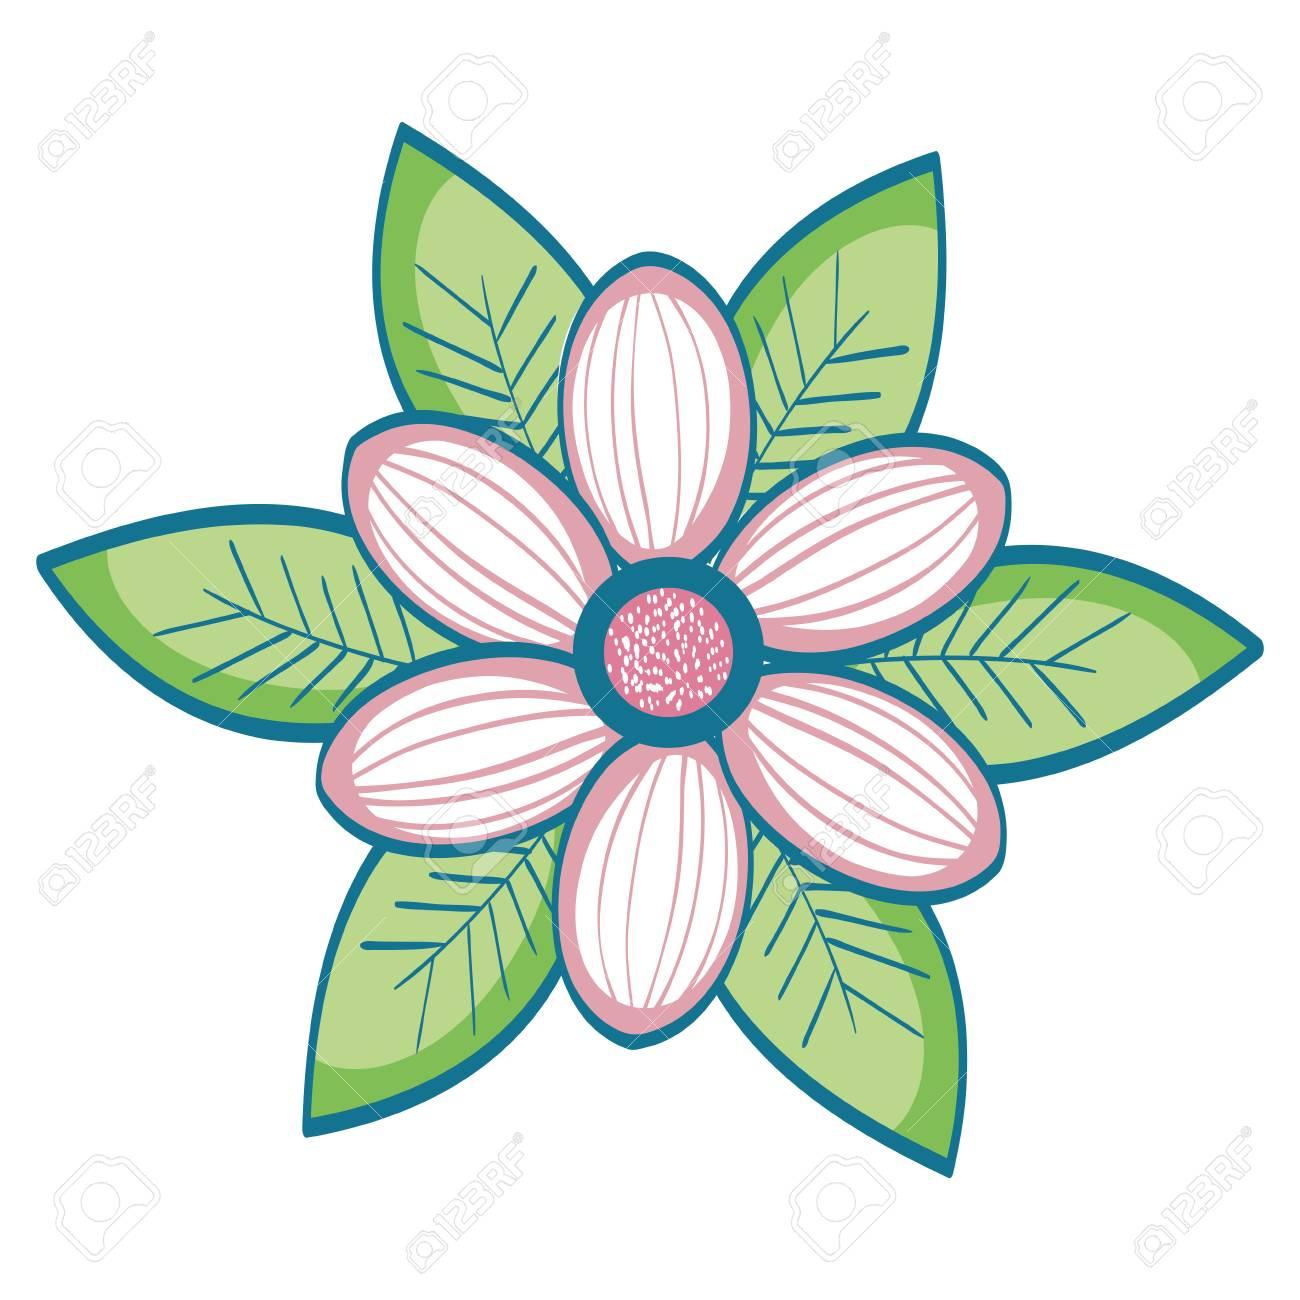 Naturals Flowers Tattoos Icon Vector Illustration Design Graphic